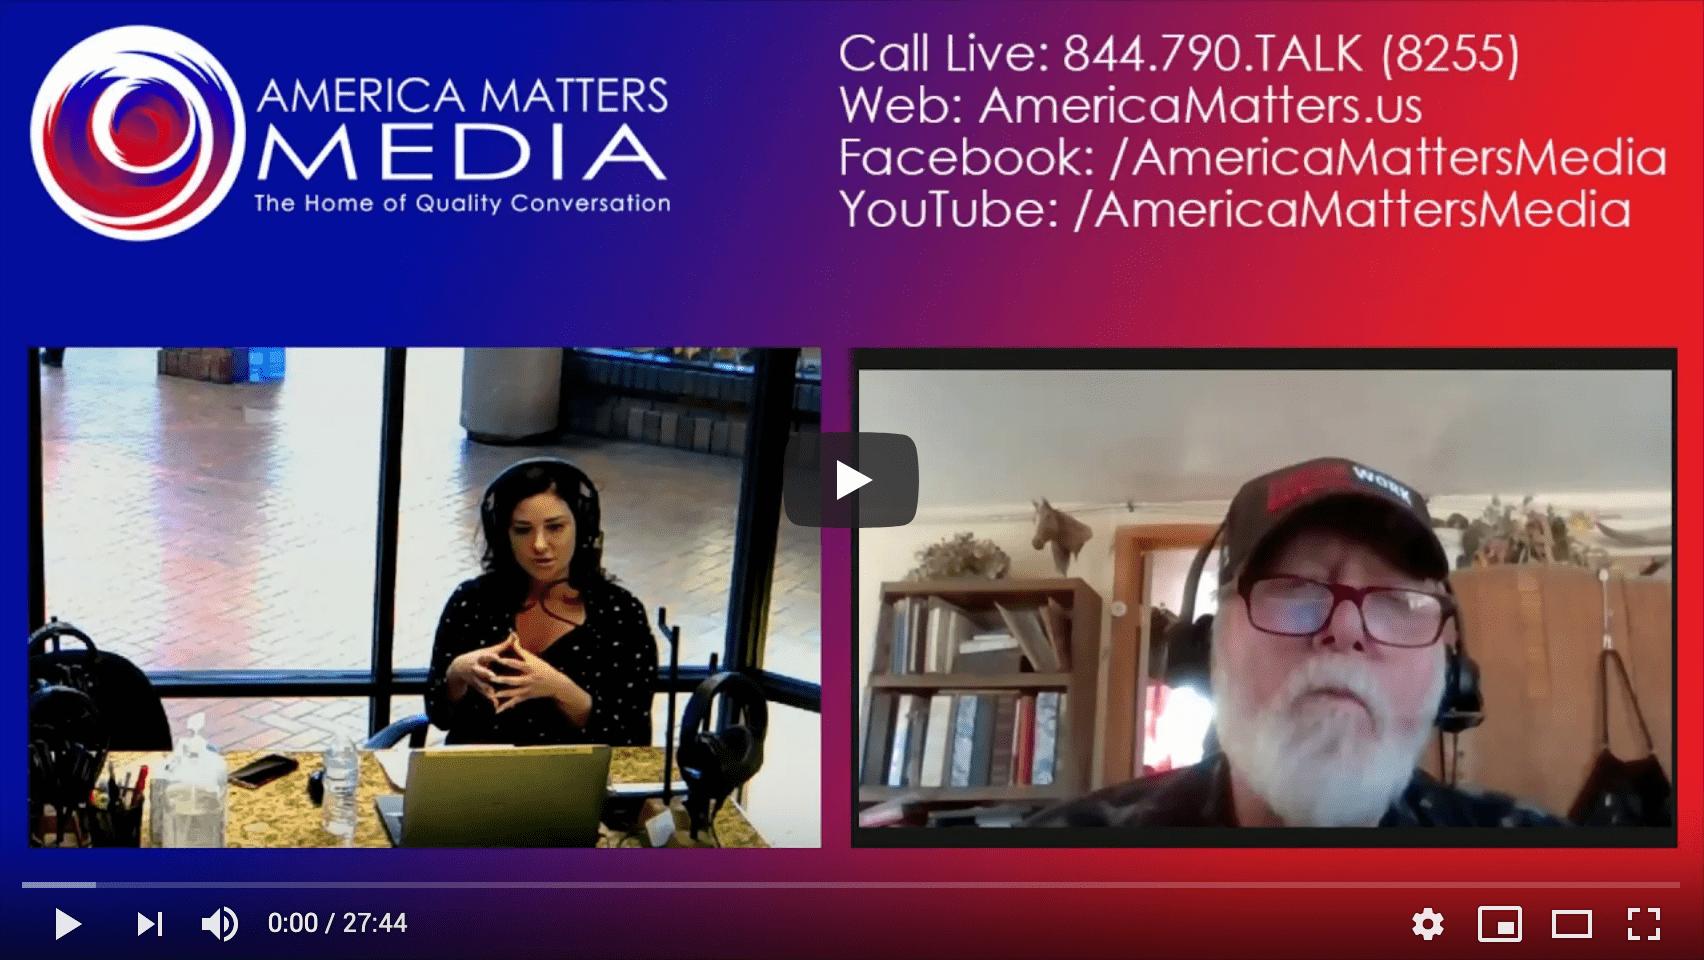 America Matters Media